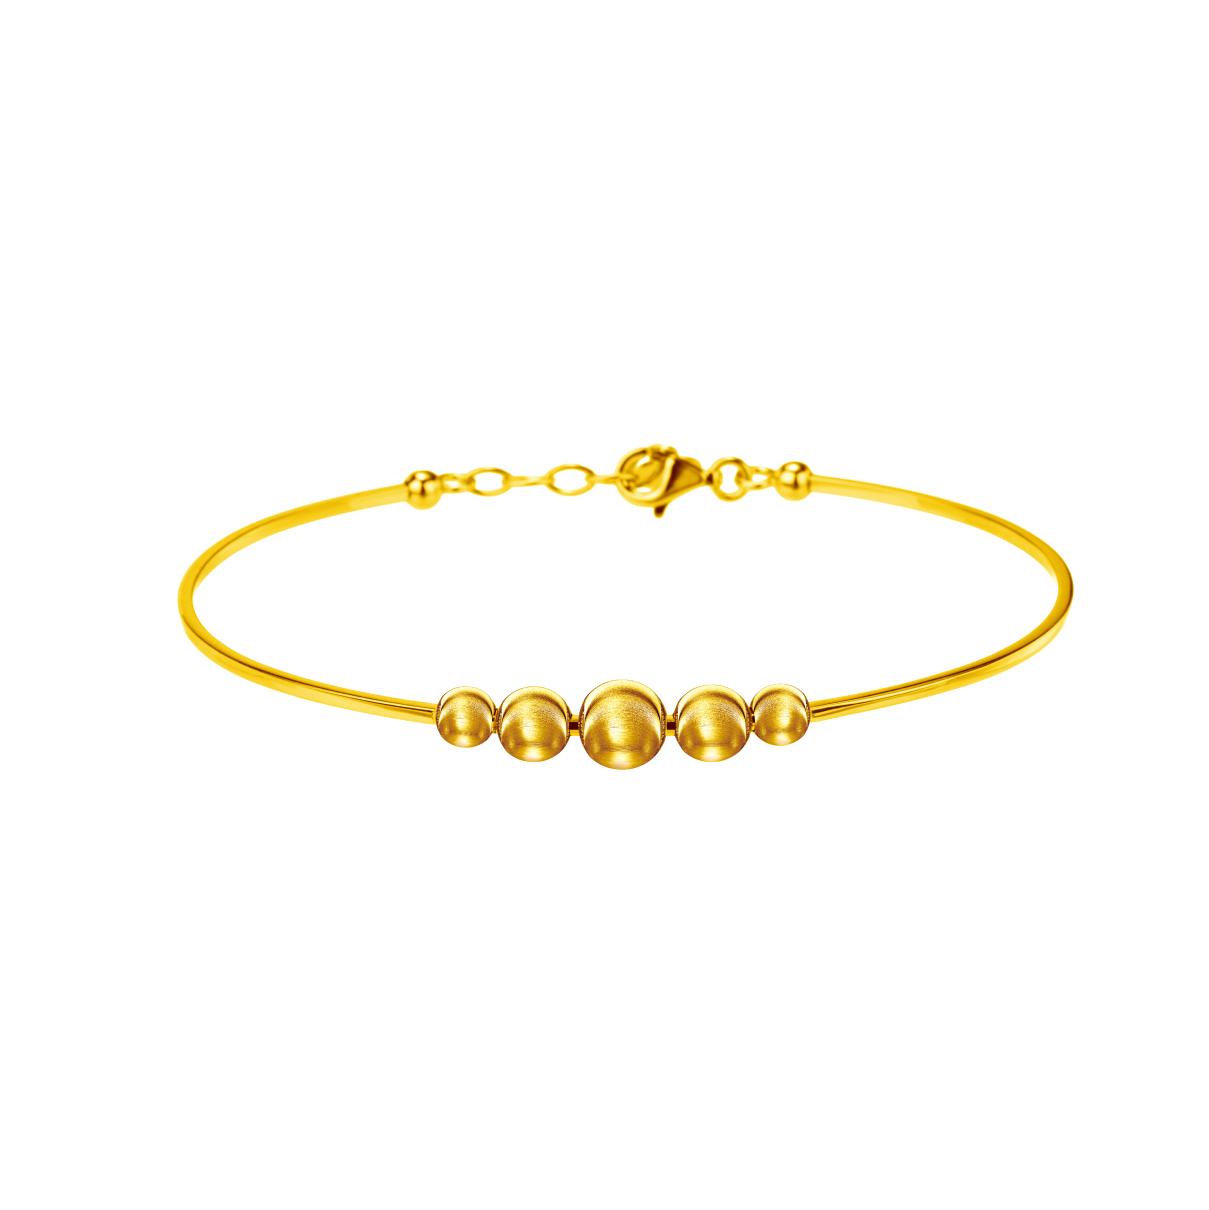 Goldstyle「晶型」手镯